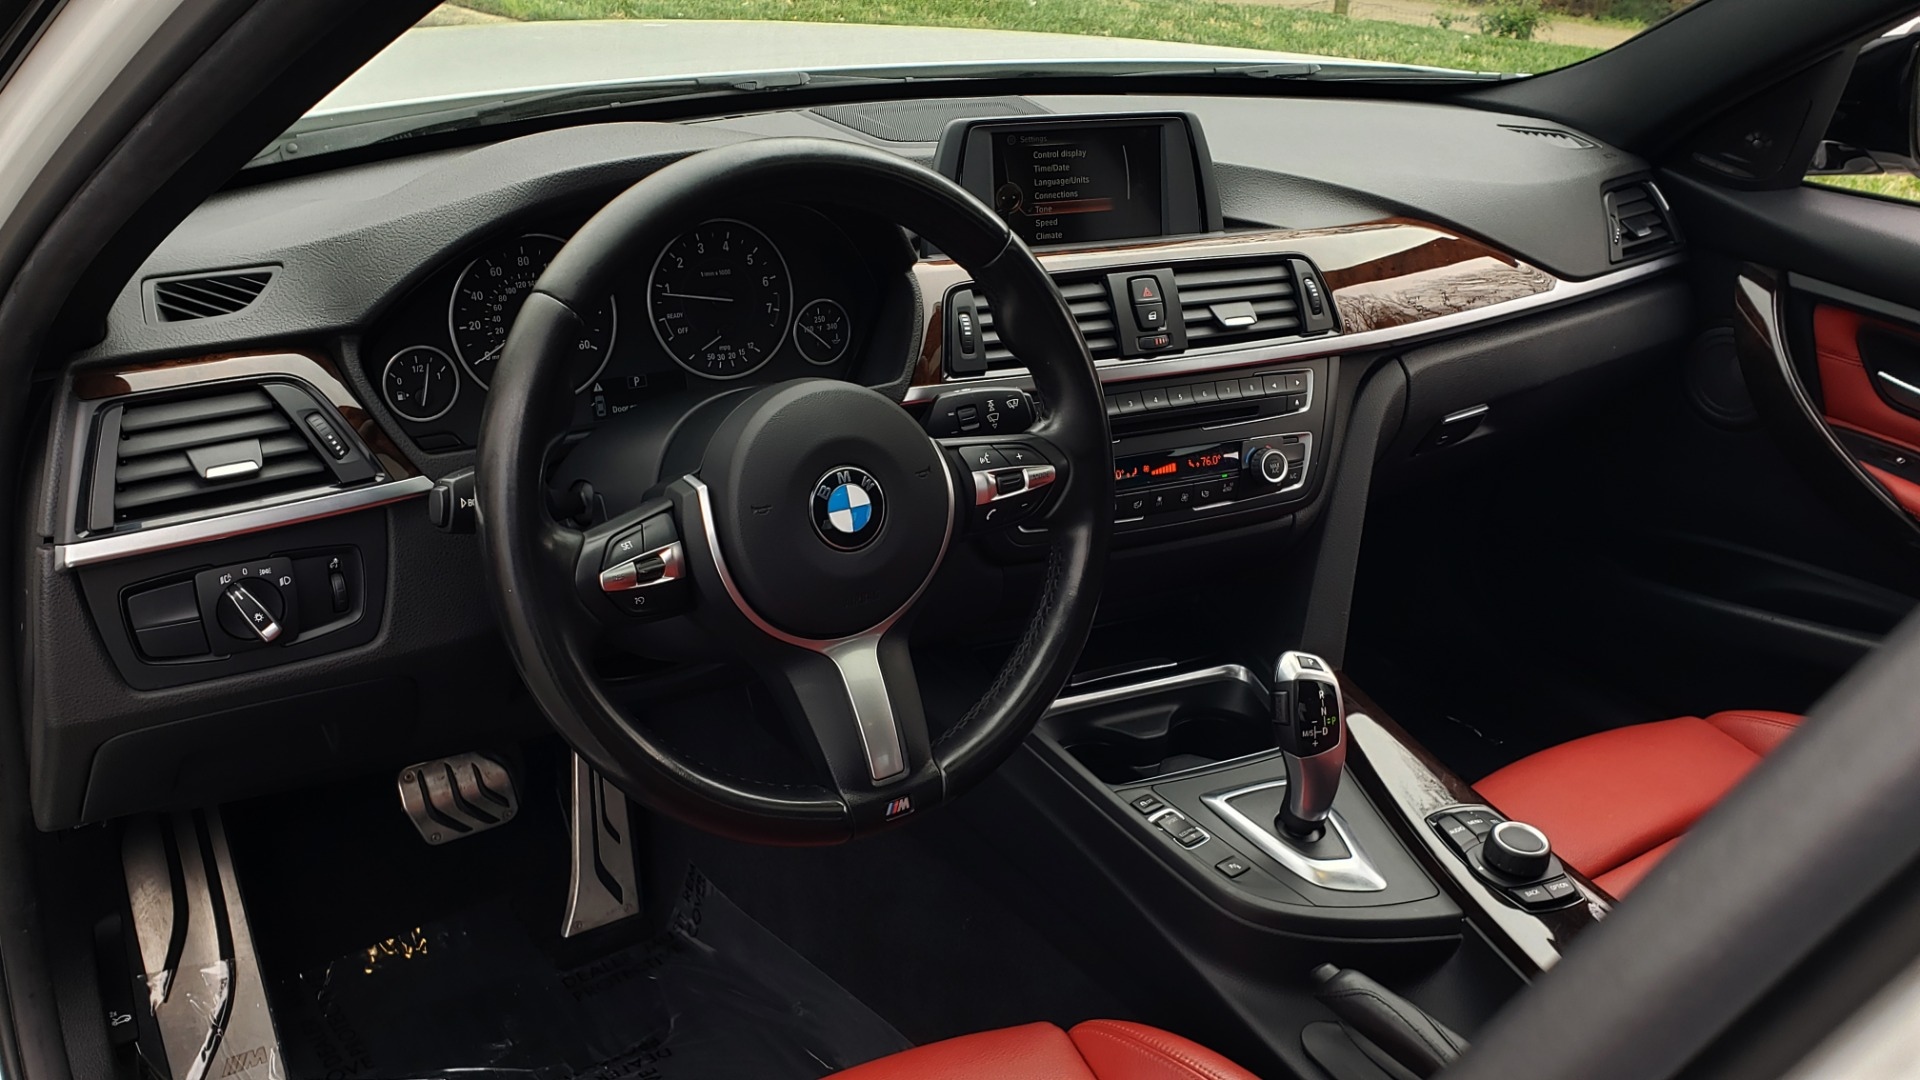 Used 2015 BMW 3 Series 335I M-SPORT / PREM PKG / HK SND / SUNROOF / REARVIEW for sale Sold at Formula Imports in Charlotte NC 28227 38